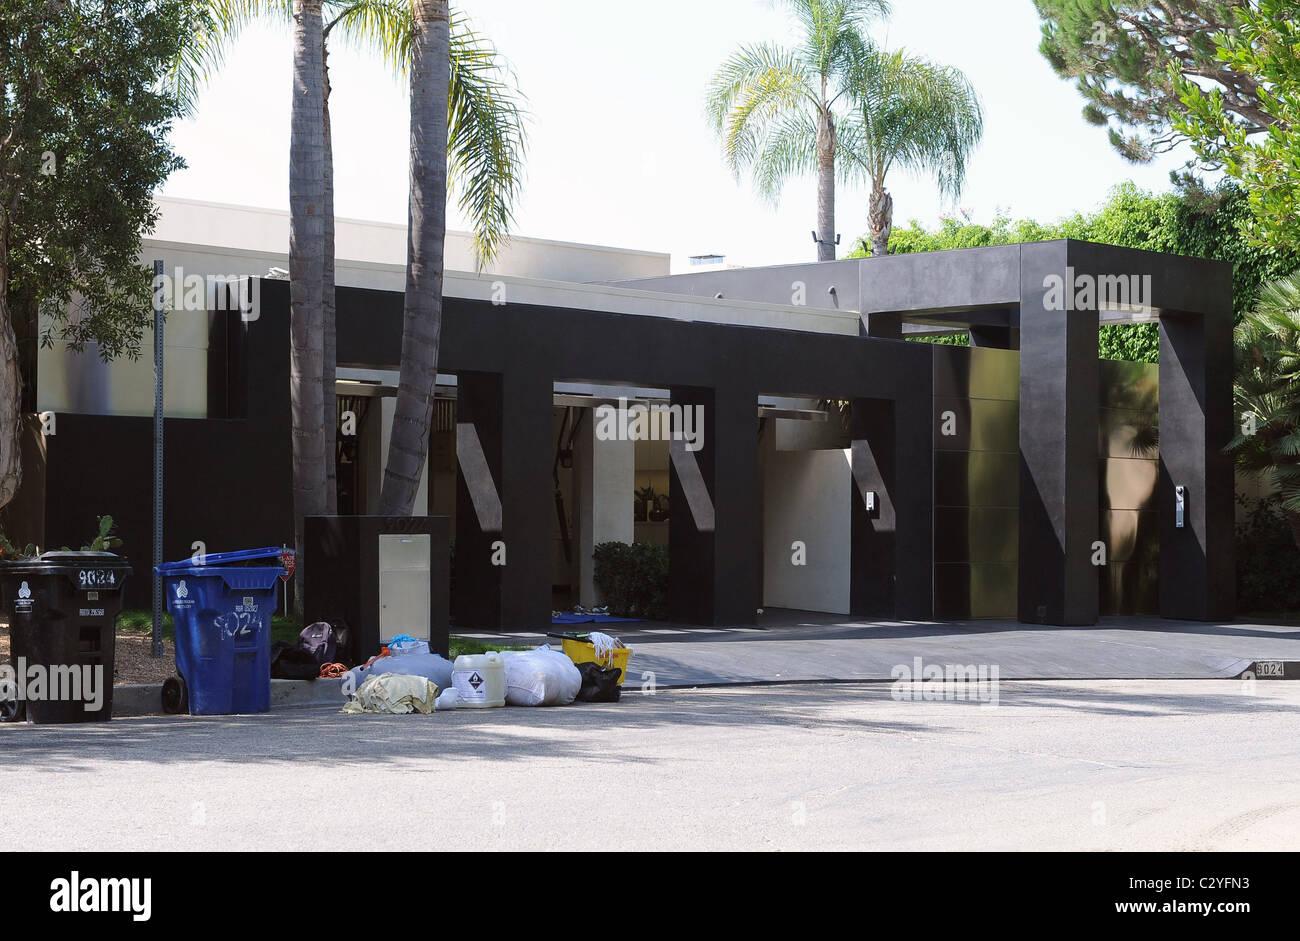 Keanu Reeves' Home Los Angeles, California - 27.08.08 Stock Photo ...